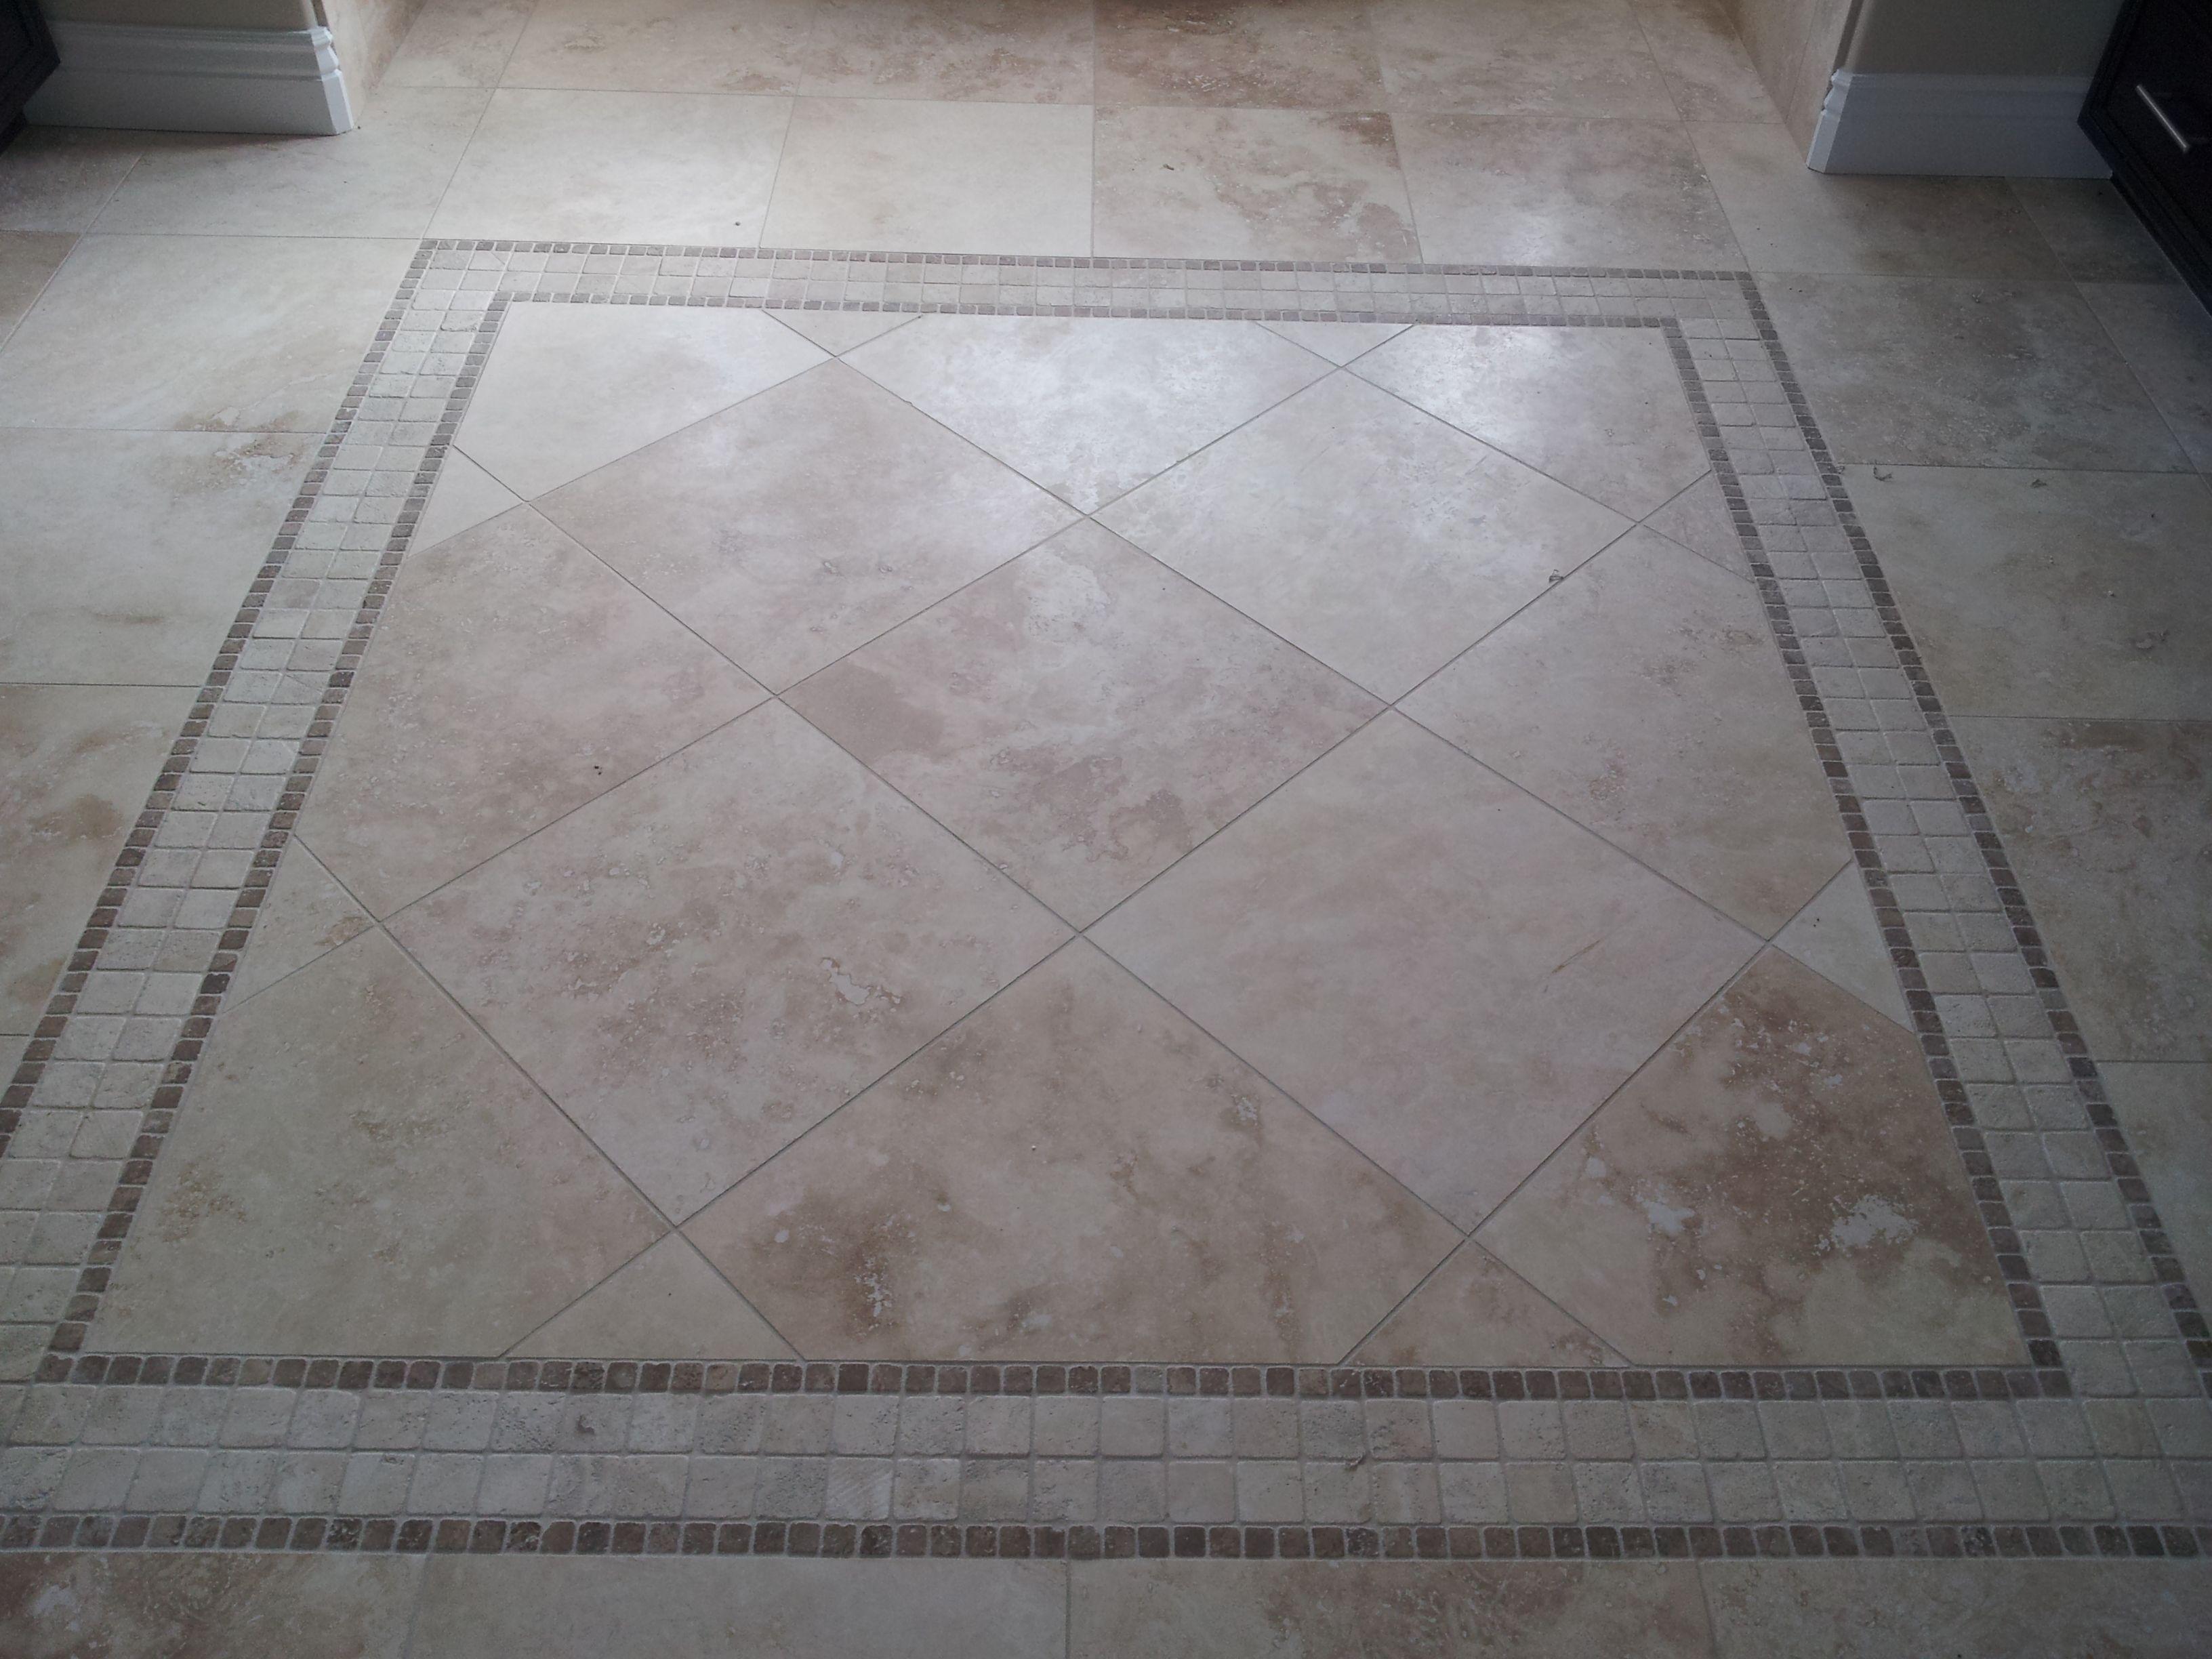 Travertine 18 X 18 Tile Rug In Master Bathroom To Learn More Visit Us At Www Capellinteriors Com Entry Tile Tile Rug Hallway Flooring